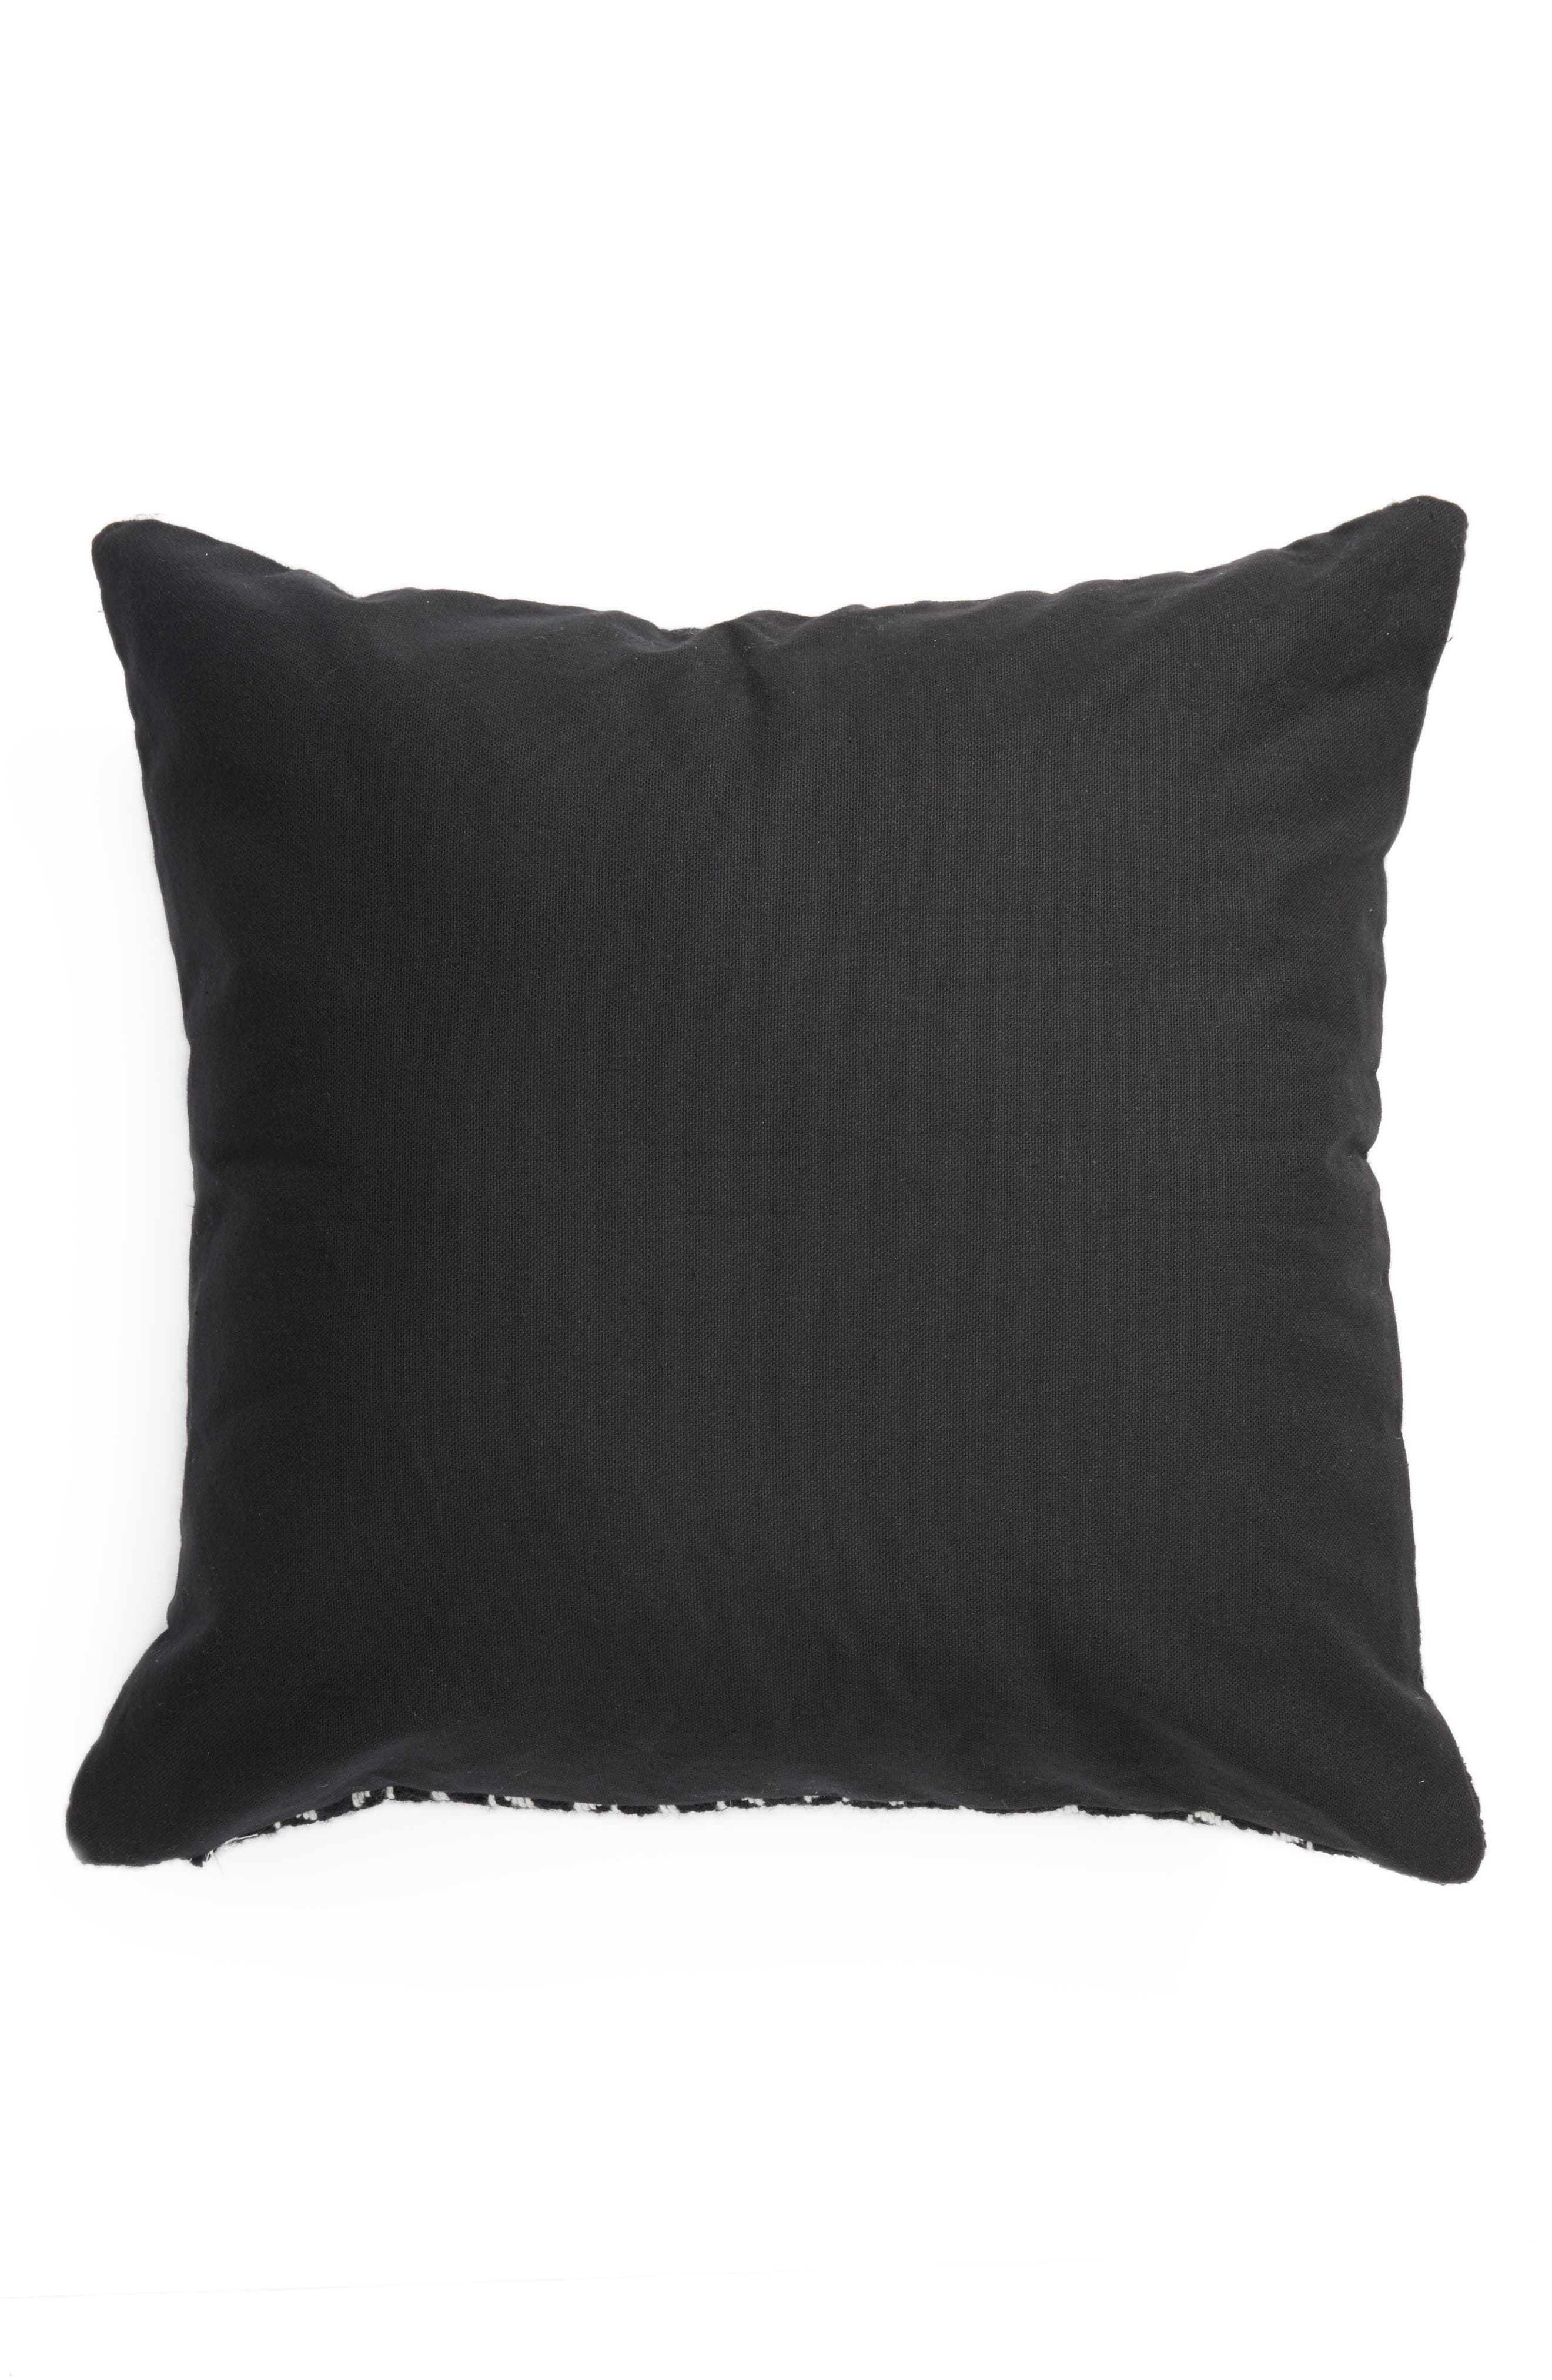 Moroccan Woven Pillow,                             Alternate thumbnail 2, color,